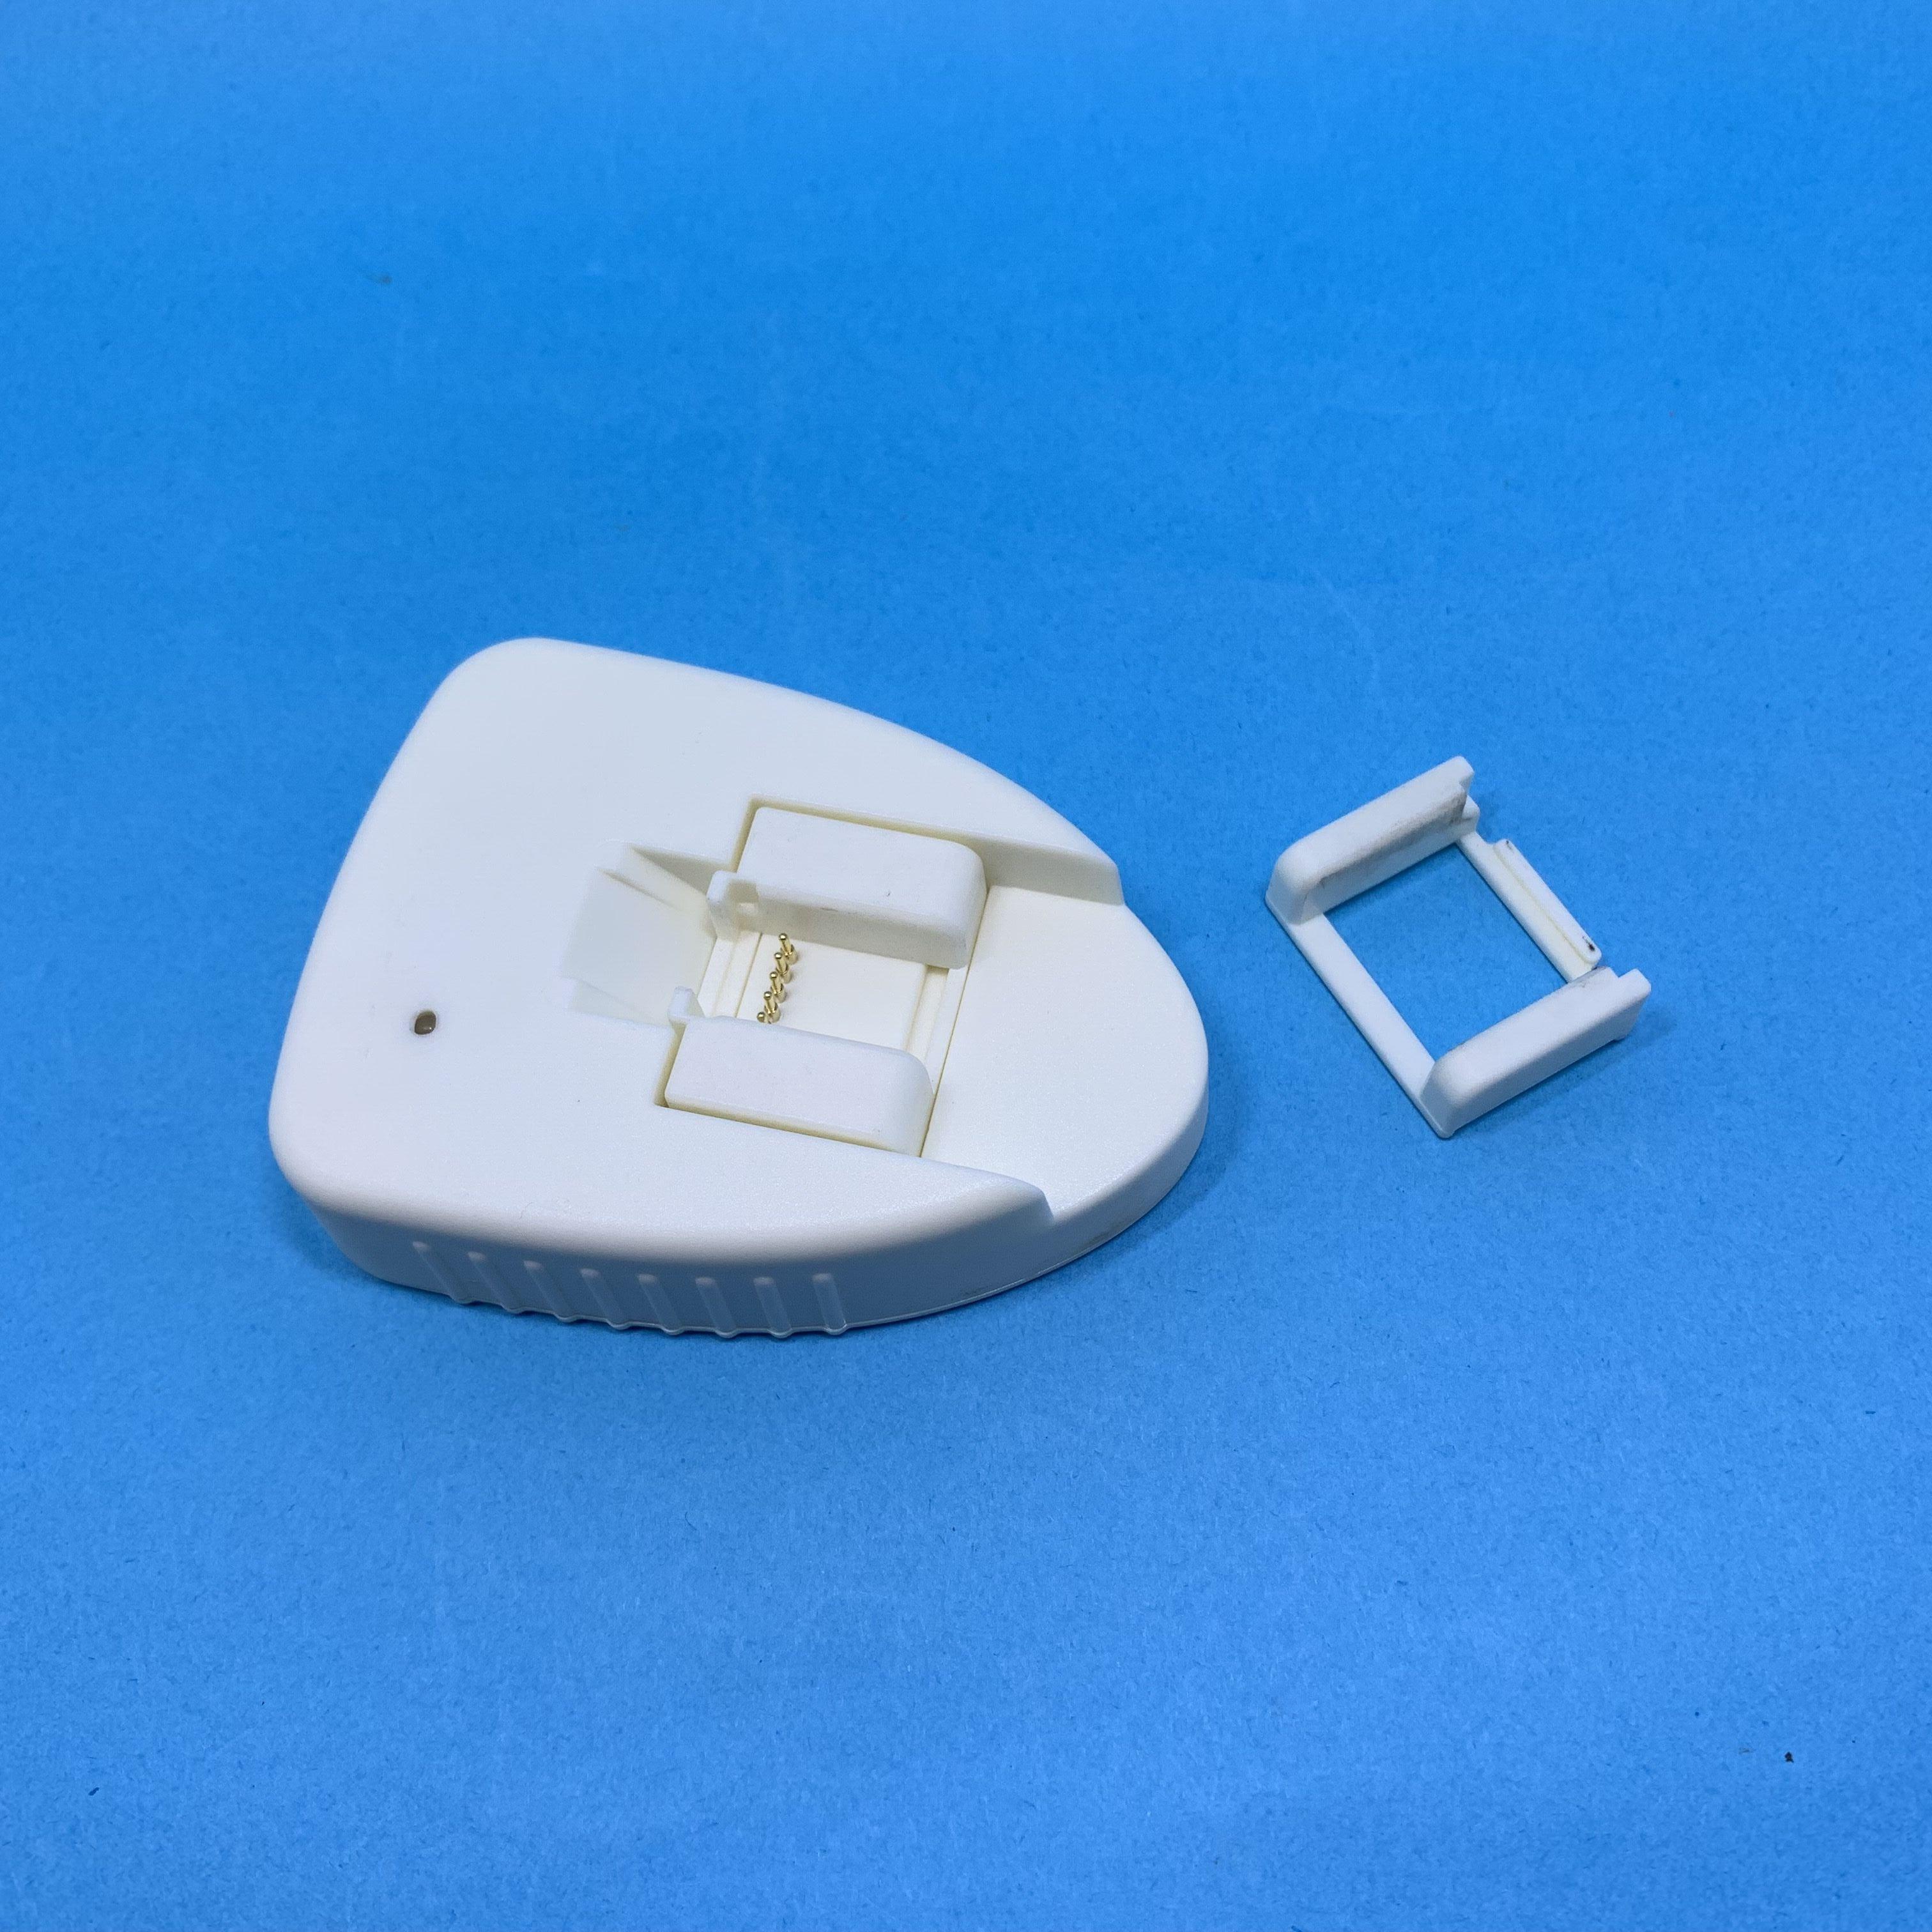 YOTAT PGI-550XL чип resetter PGI-550 CLI-551 для Canon PIXMA IP7250 MG6350 MG5450 MX925 MX725 MG7150 MG6450 MG5550 MG5650 MG665